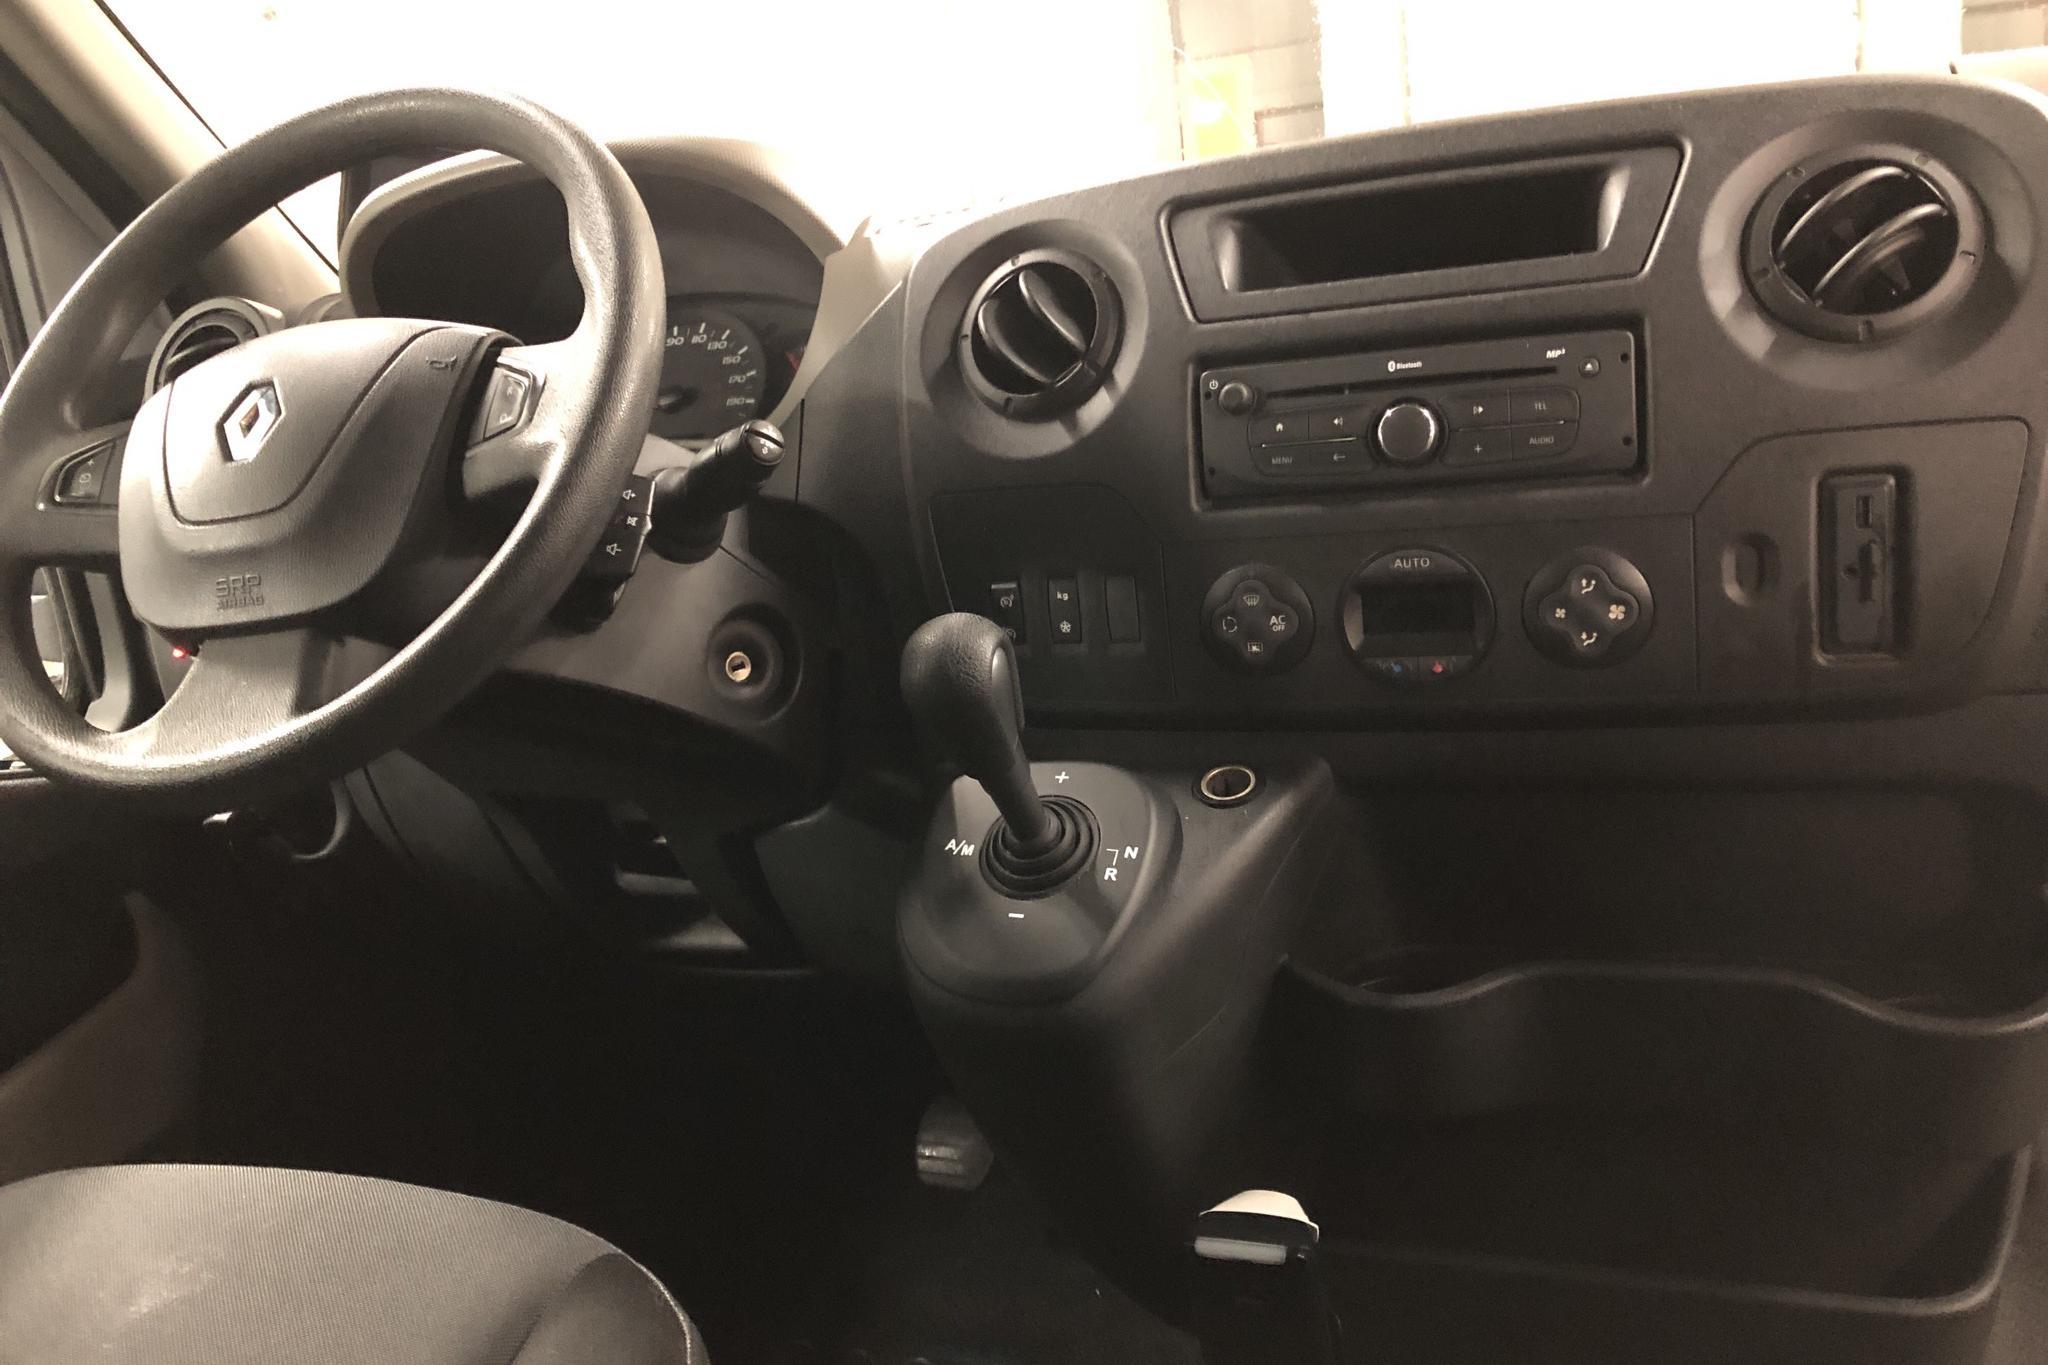 Renault Master 2.3 dCi Volymskåp 2WD (150hk) - 0 mil - Automat - vit - 2016